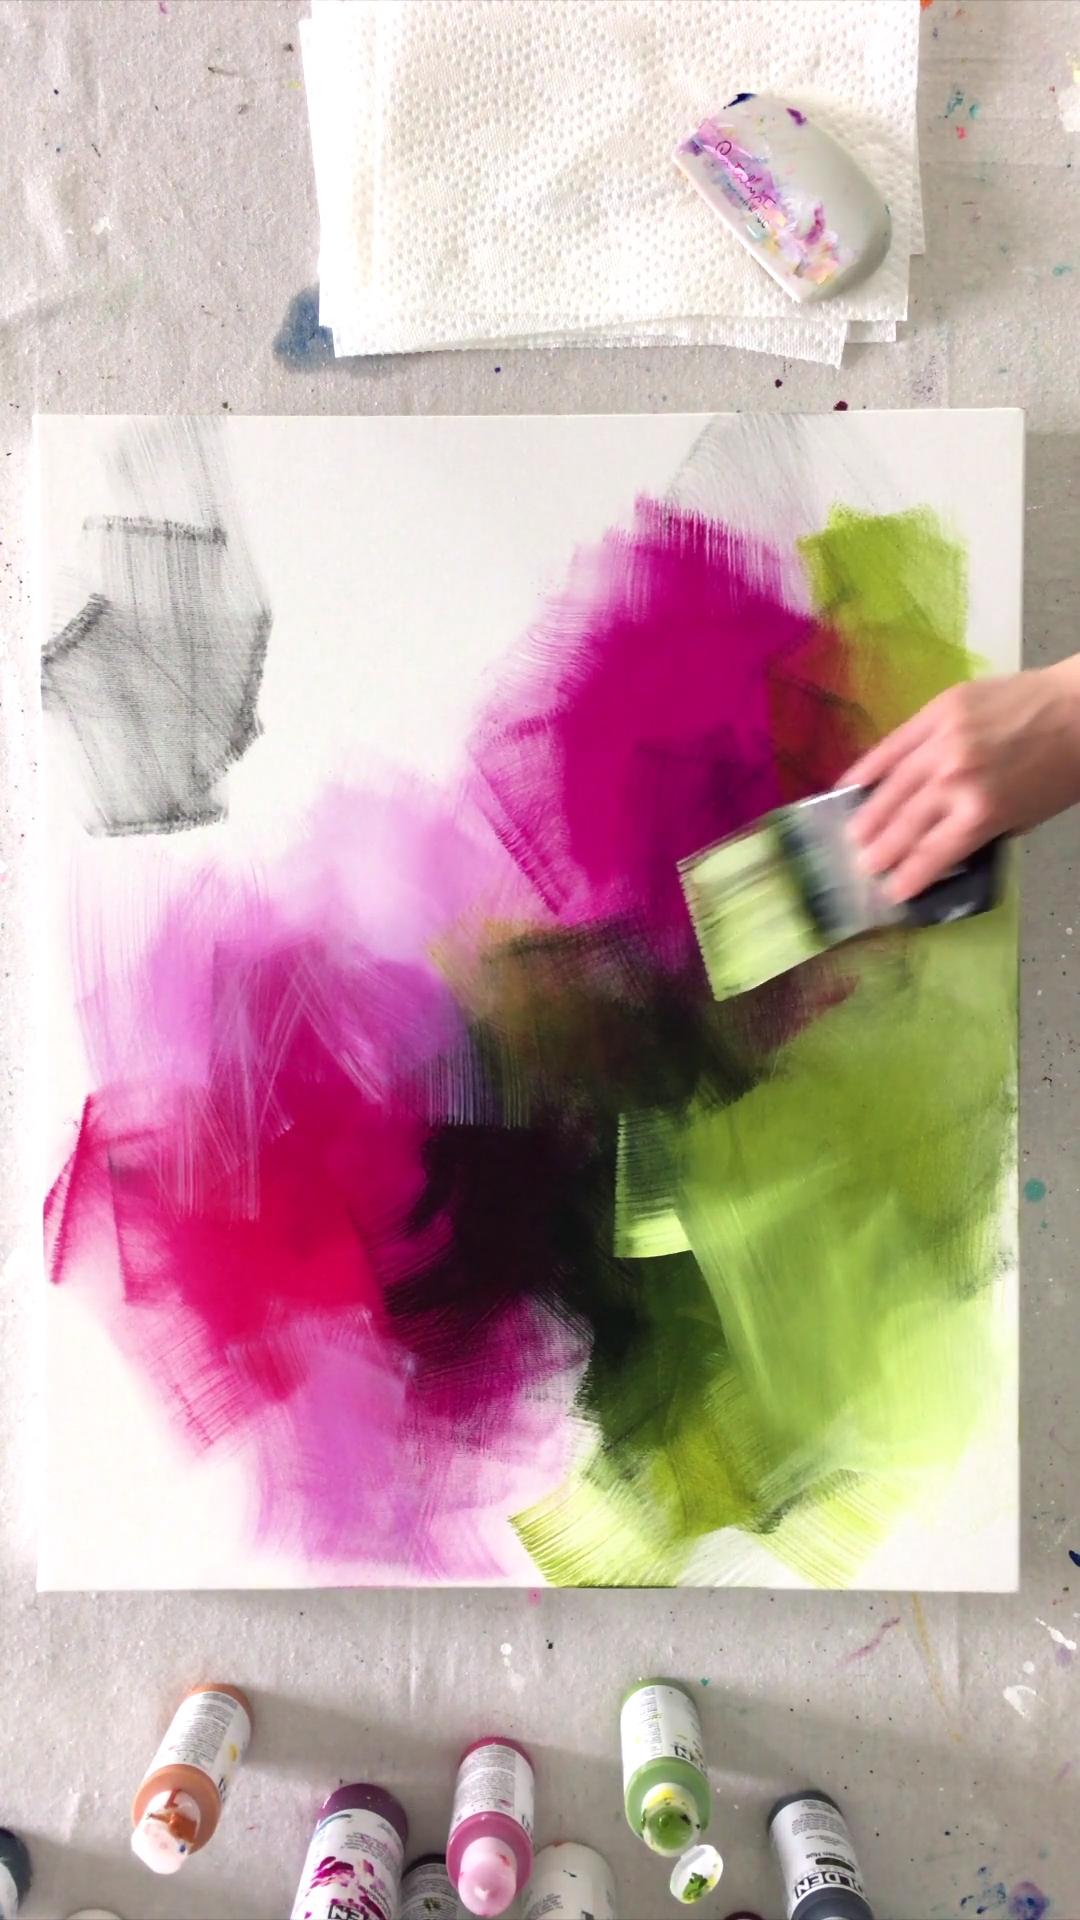 Photo of Brushwork with Acrylics